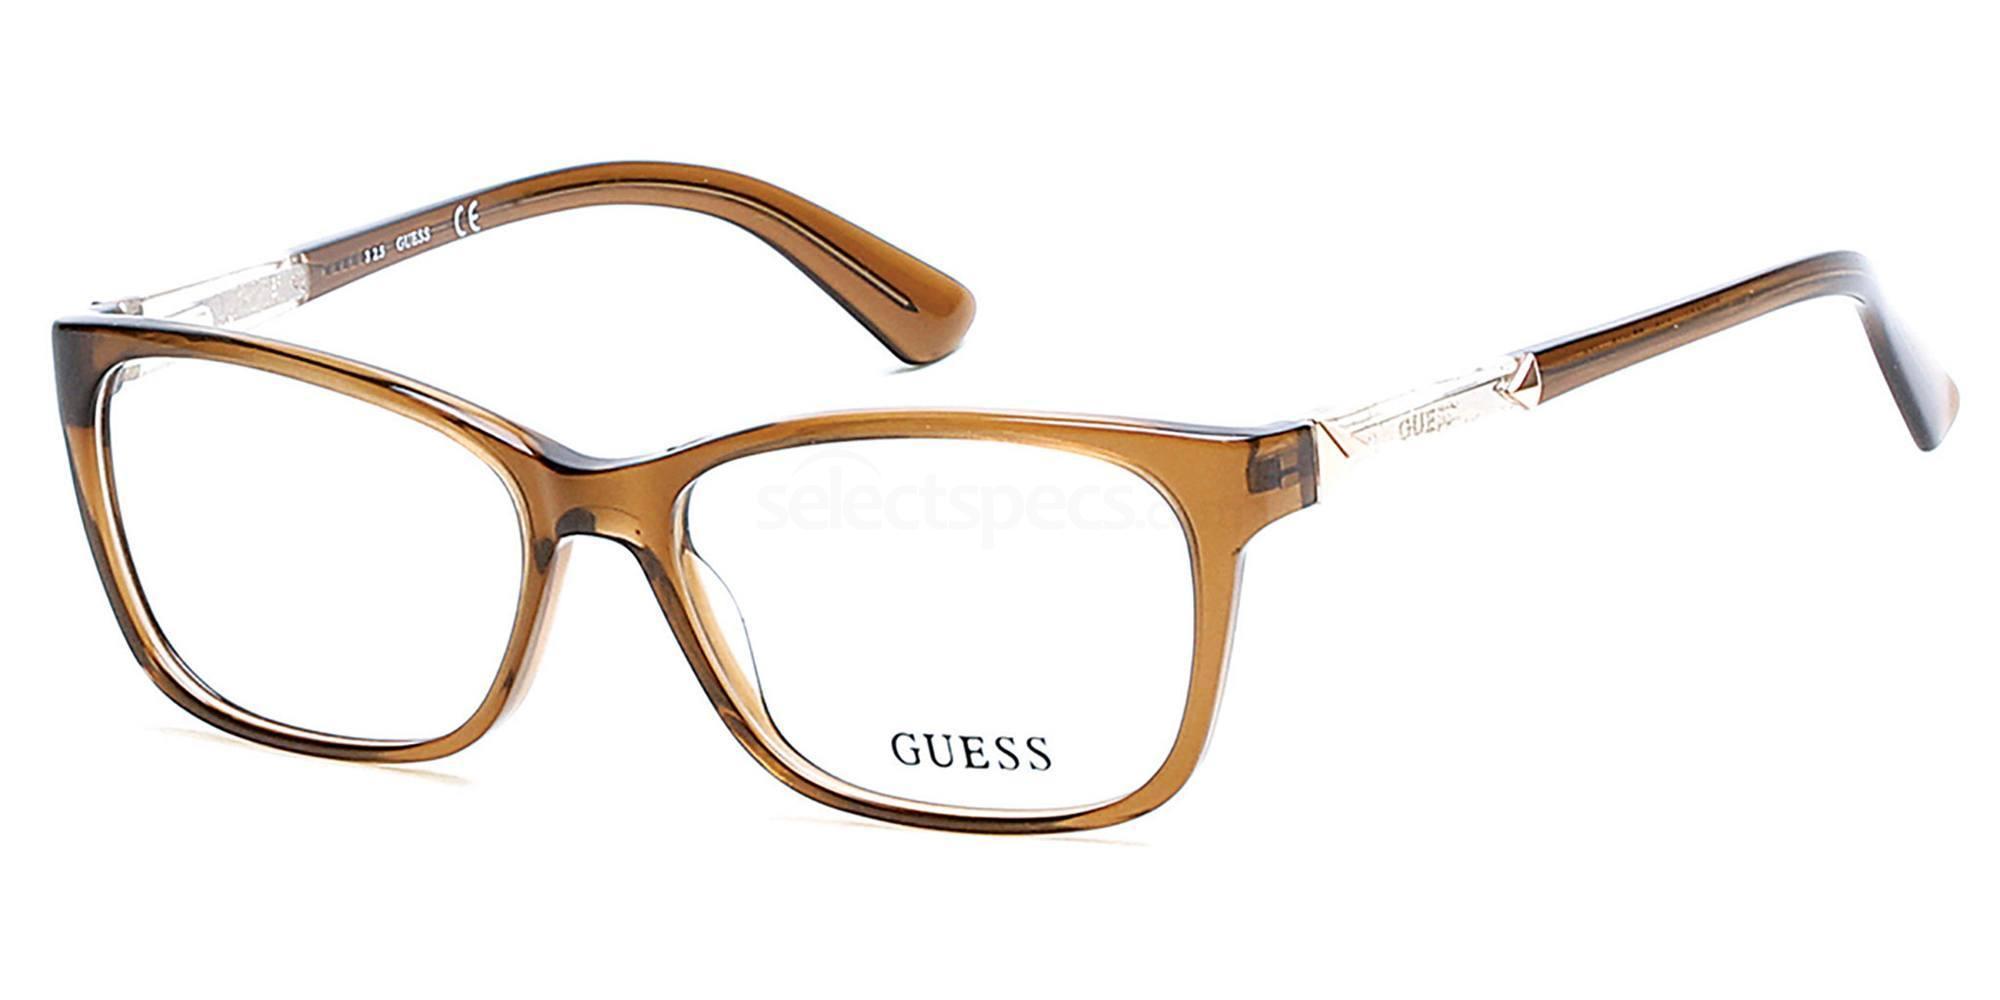 045 GU2561 Glasses, Guess